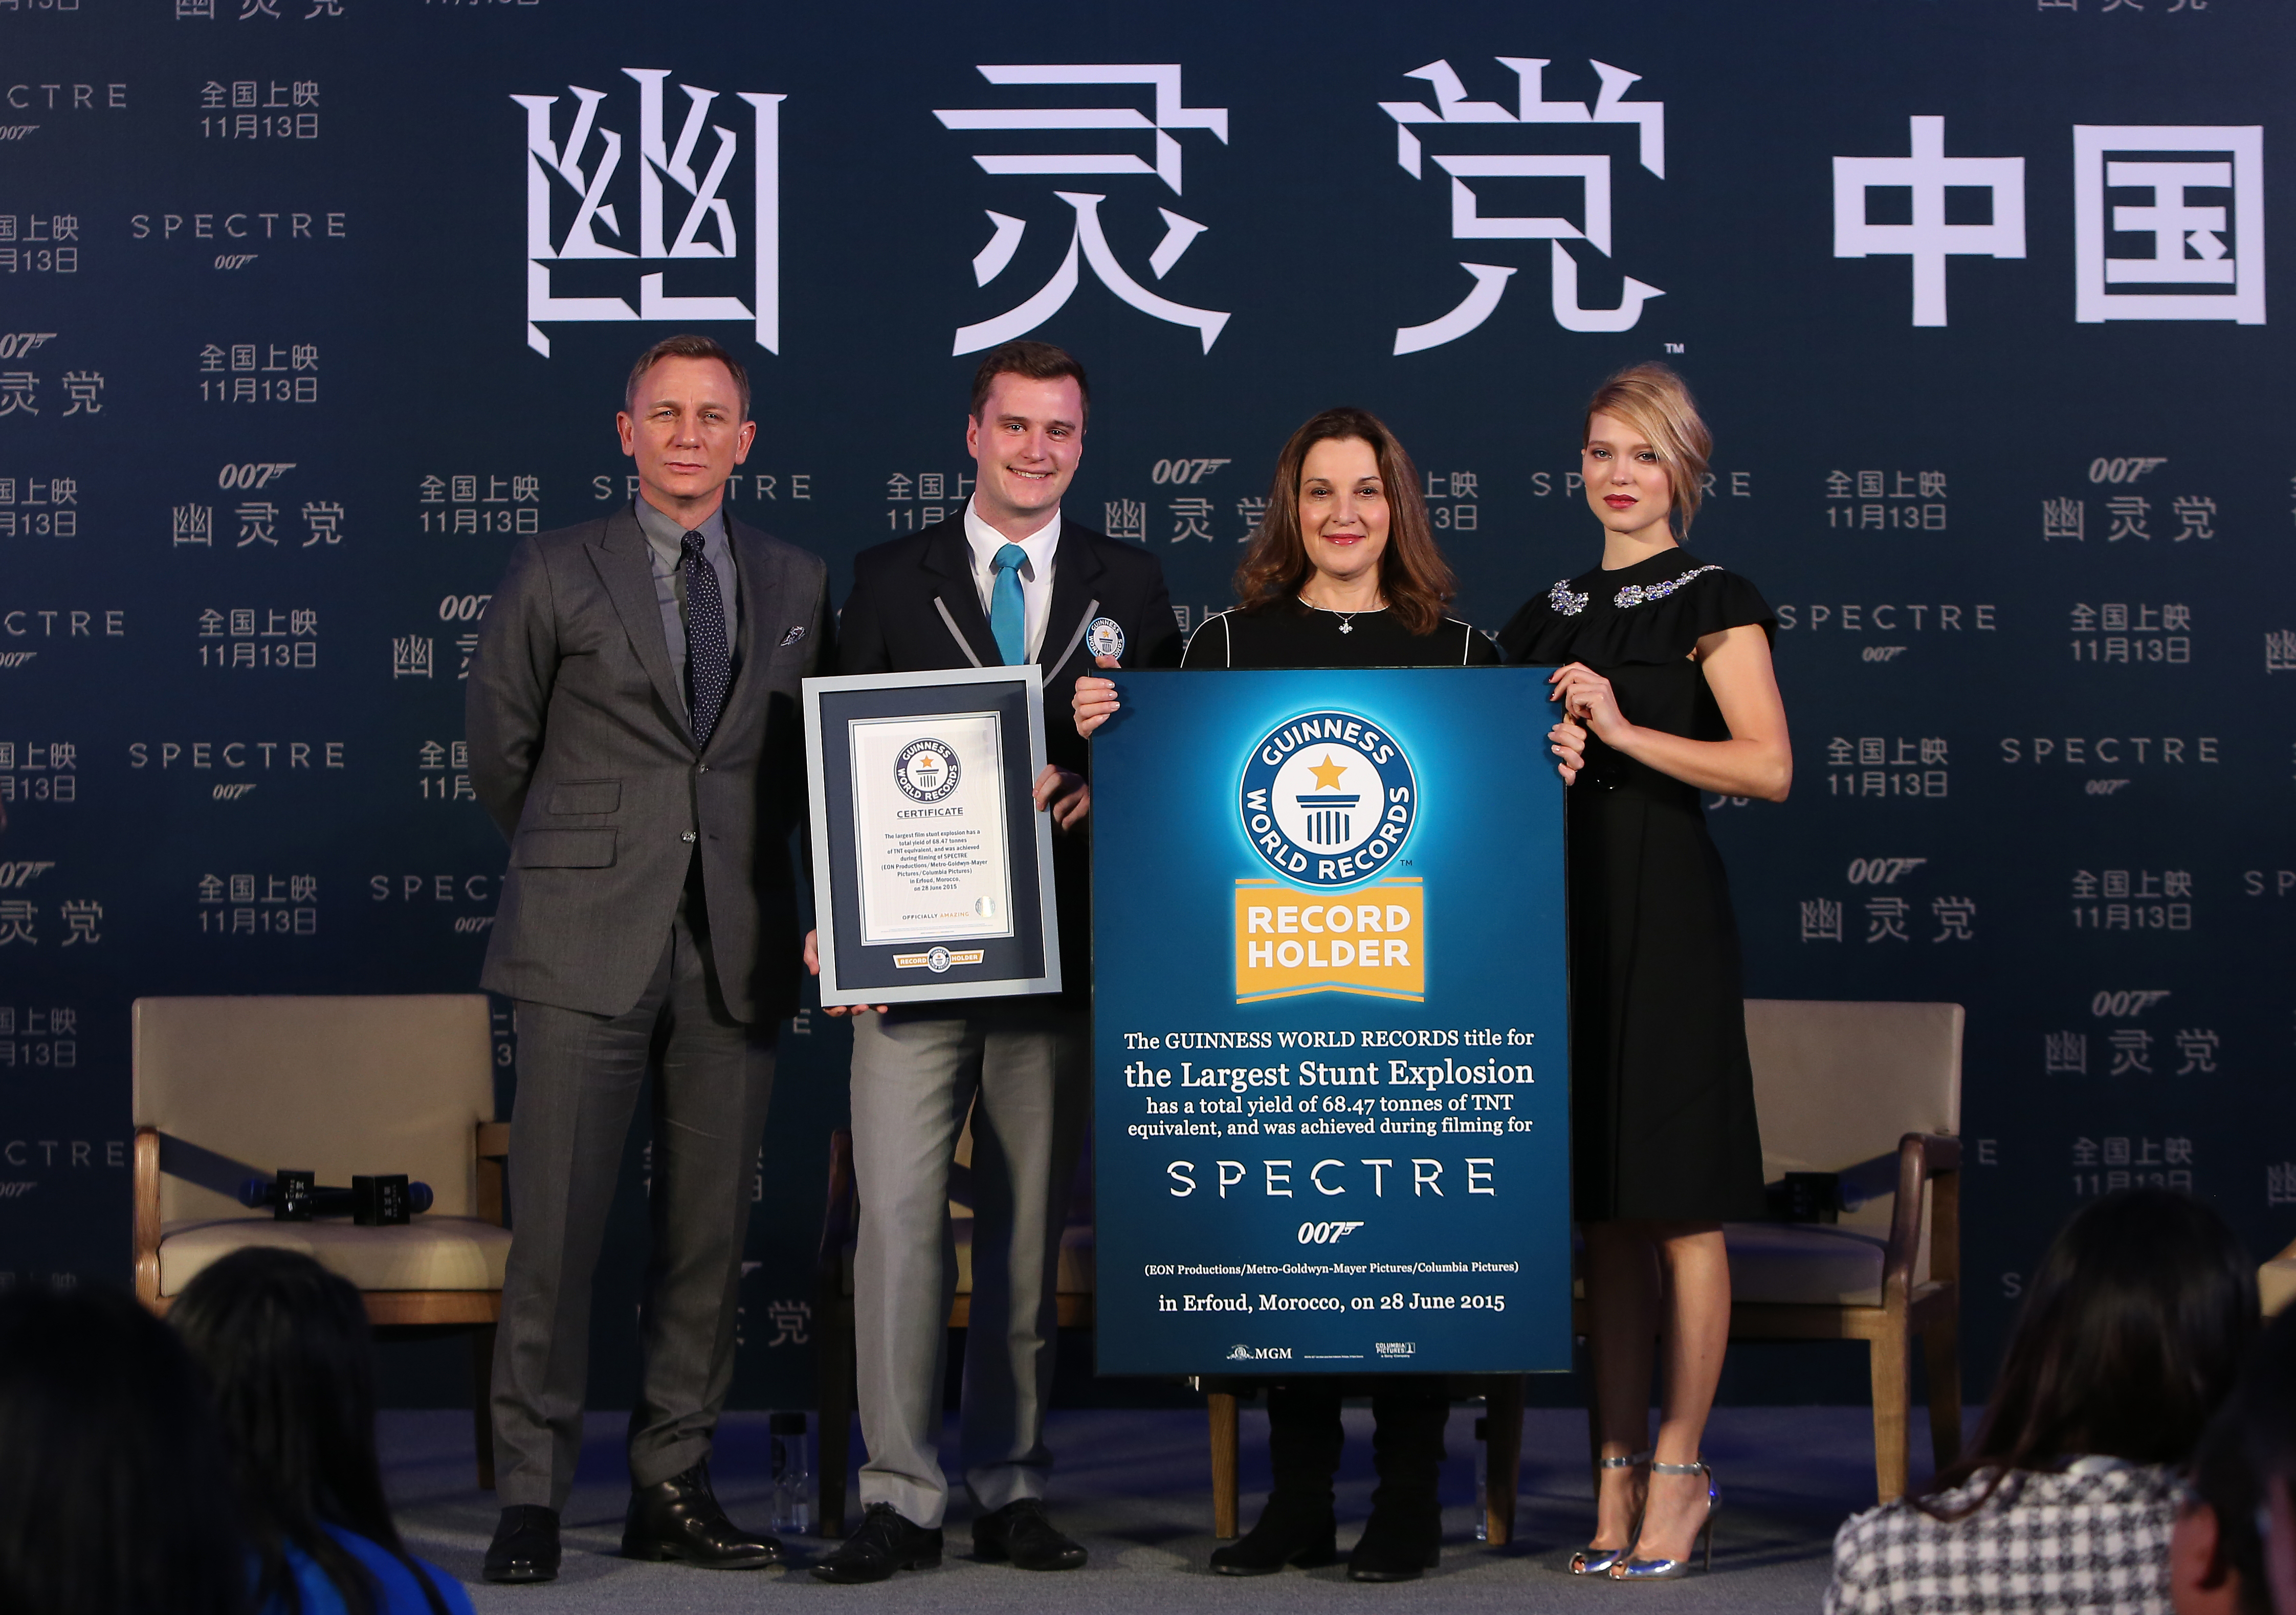 http://www.filmikamari.fi/pressit/uploads/image/SPECTRE_GWR_presentation_Beijing_November_101.JPG